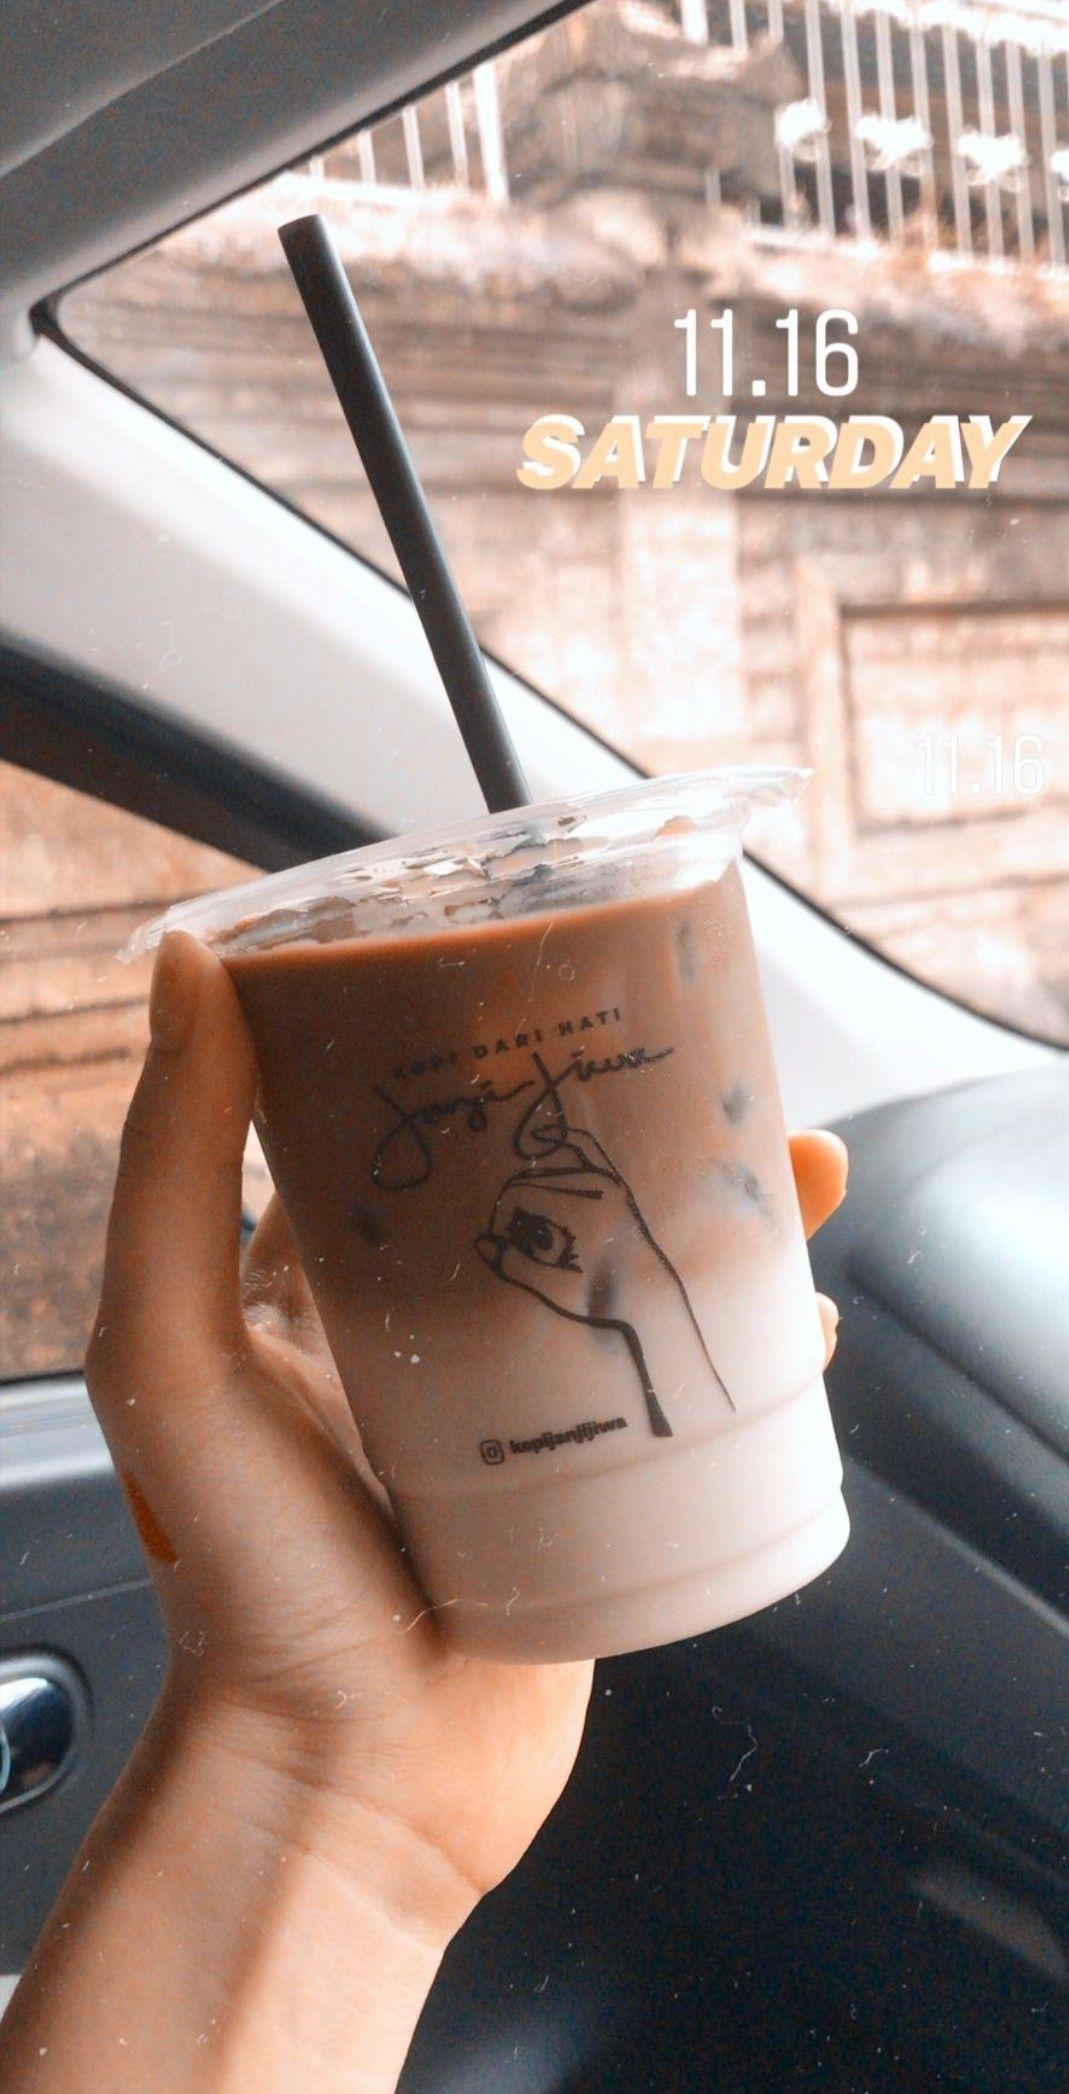 Pin Oleh Kaka Kuaurel Di Drink Kopi Minuman Smoothies Minuman